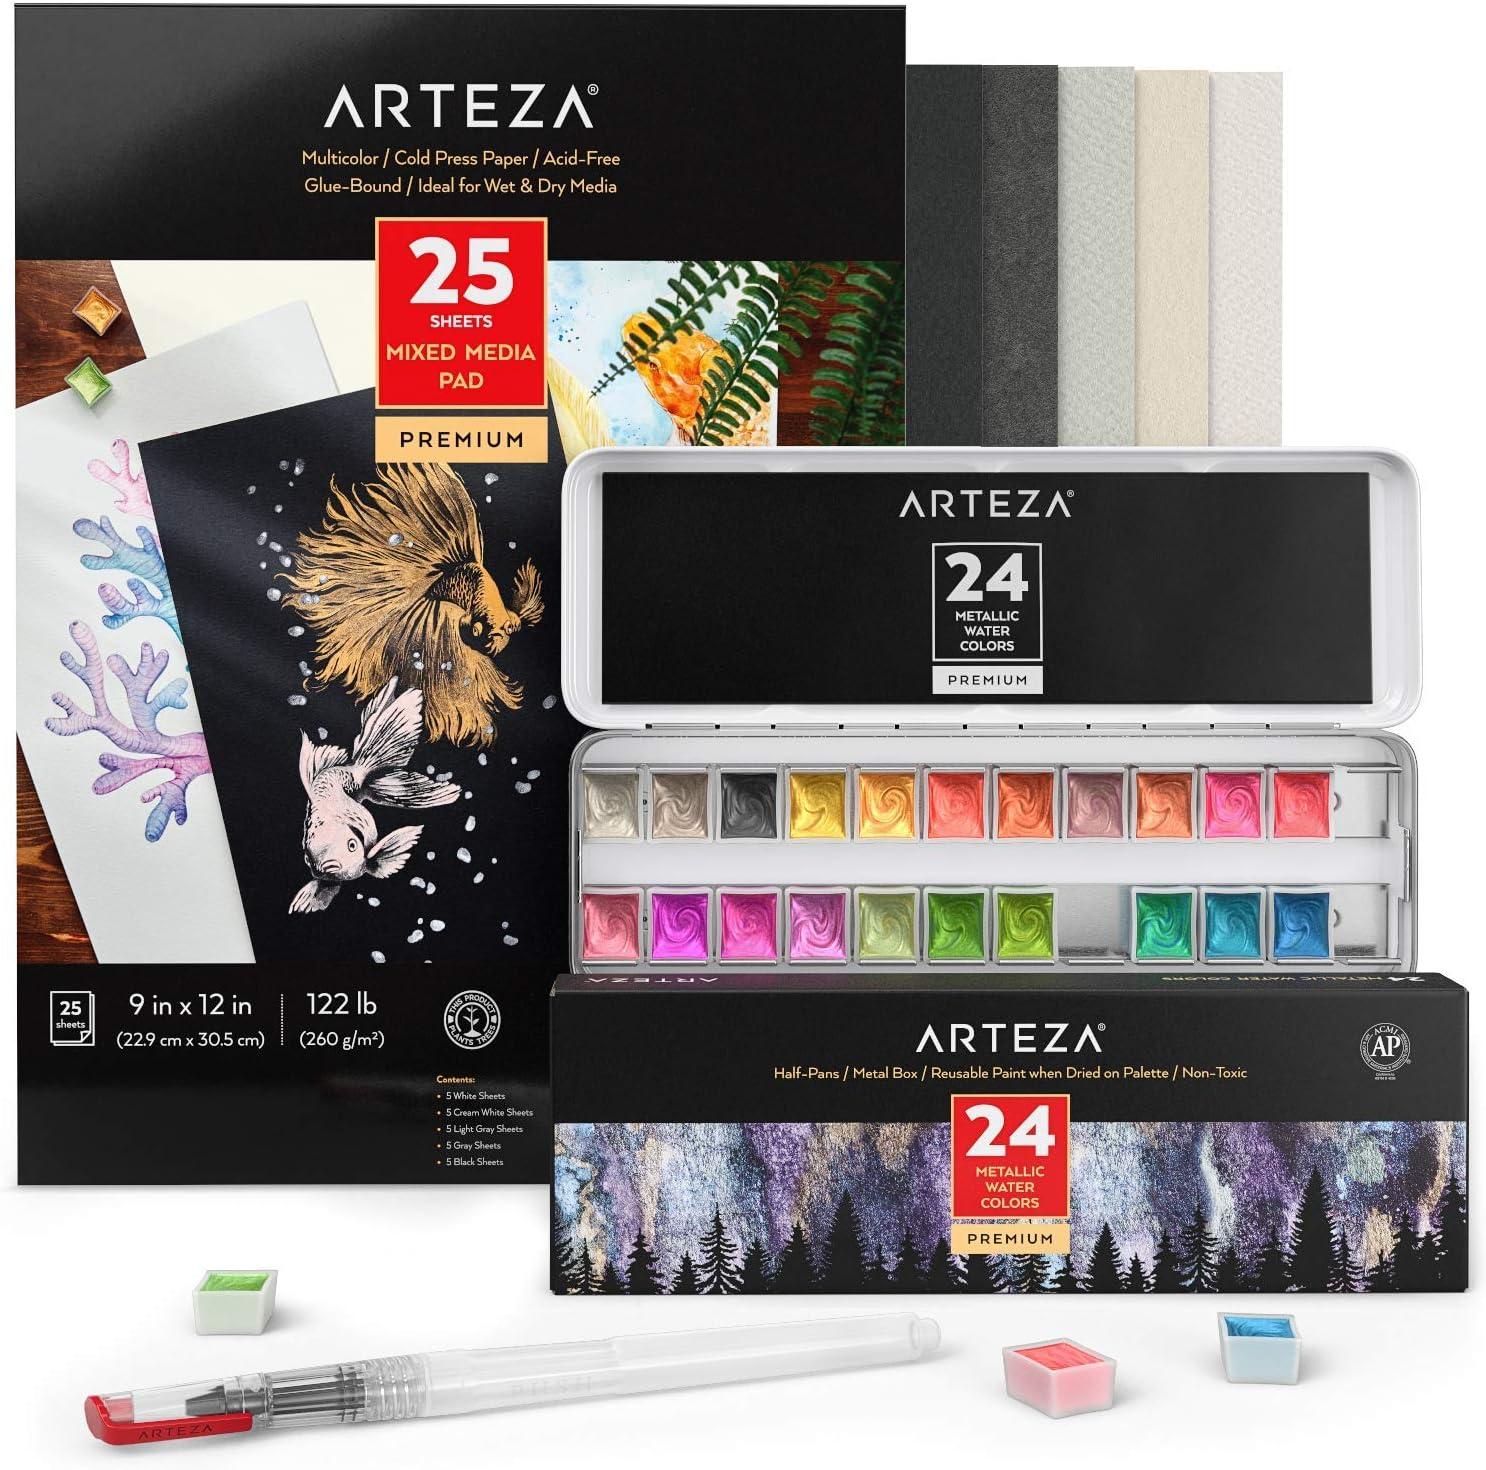 Arteza Metallic Watercolor Paint Art Set, Bundle of 24 Half-Pans, Water Brush Pen & Colored Watercolor Pad (25 Sheets, 5 Shades of Toned Watercolor Paper), Art Supplies for Watercolor